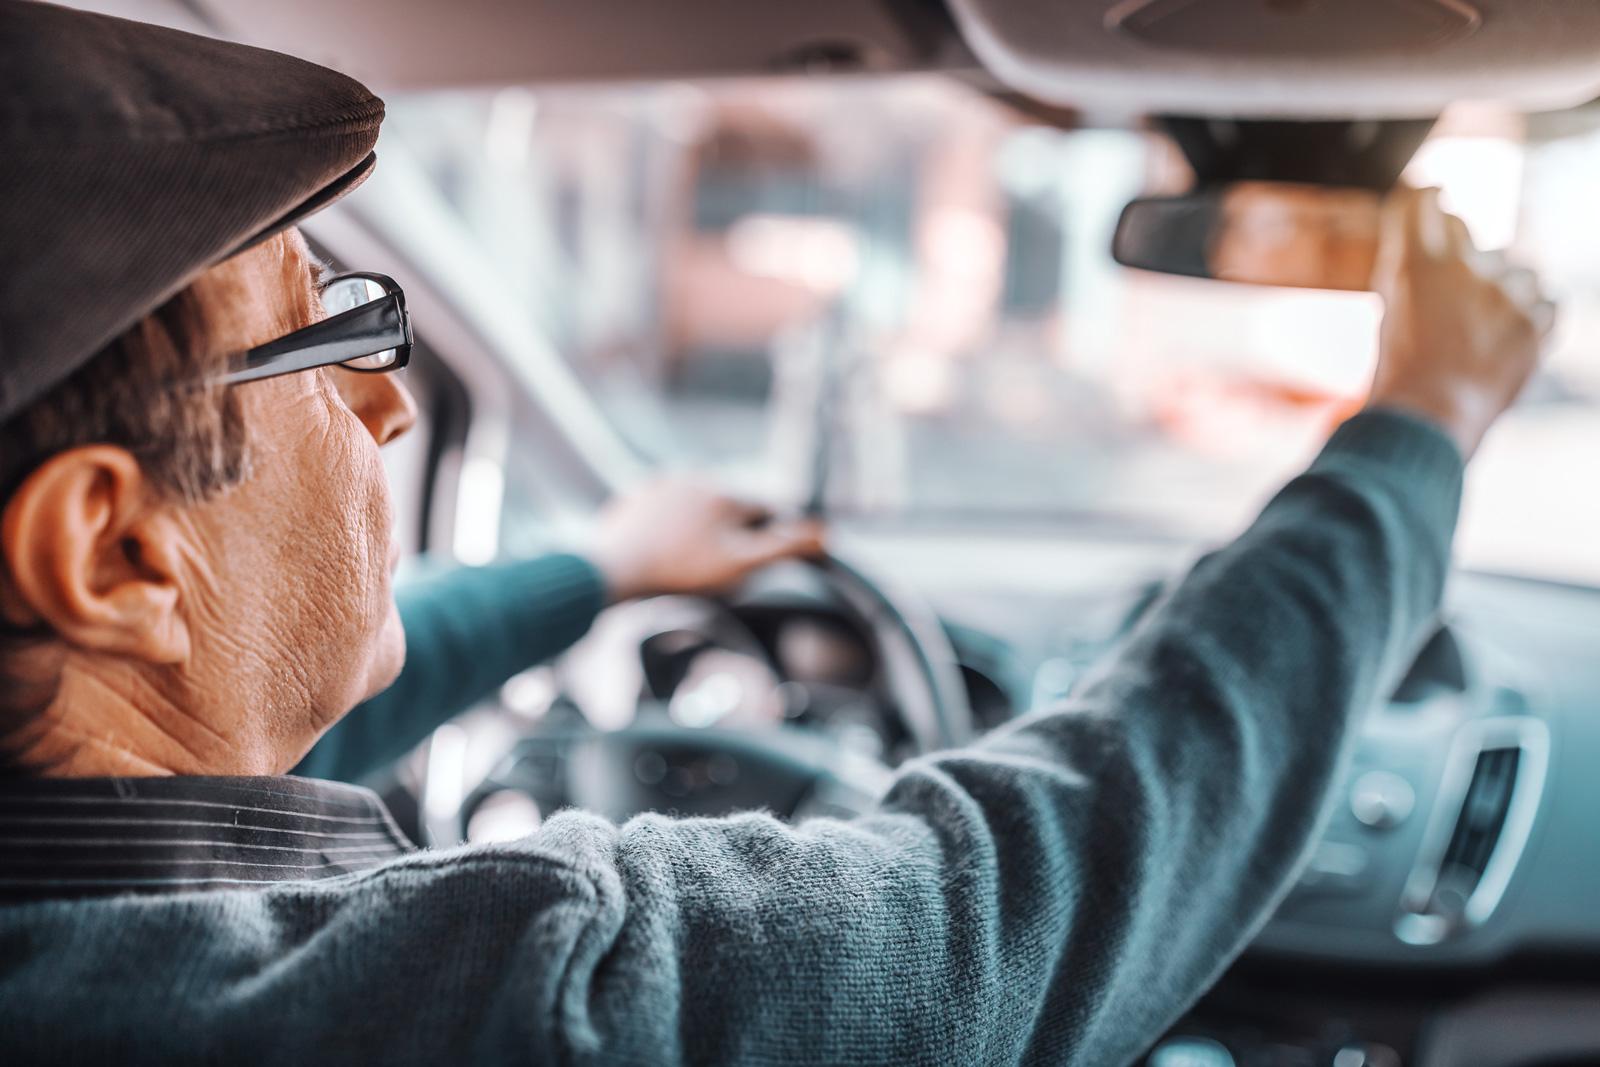 Senior adjusting rearview mirror